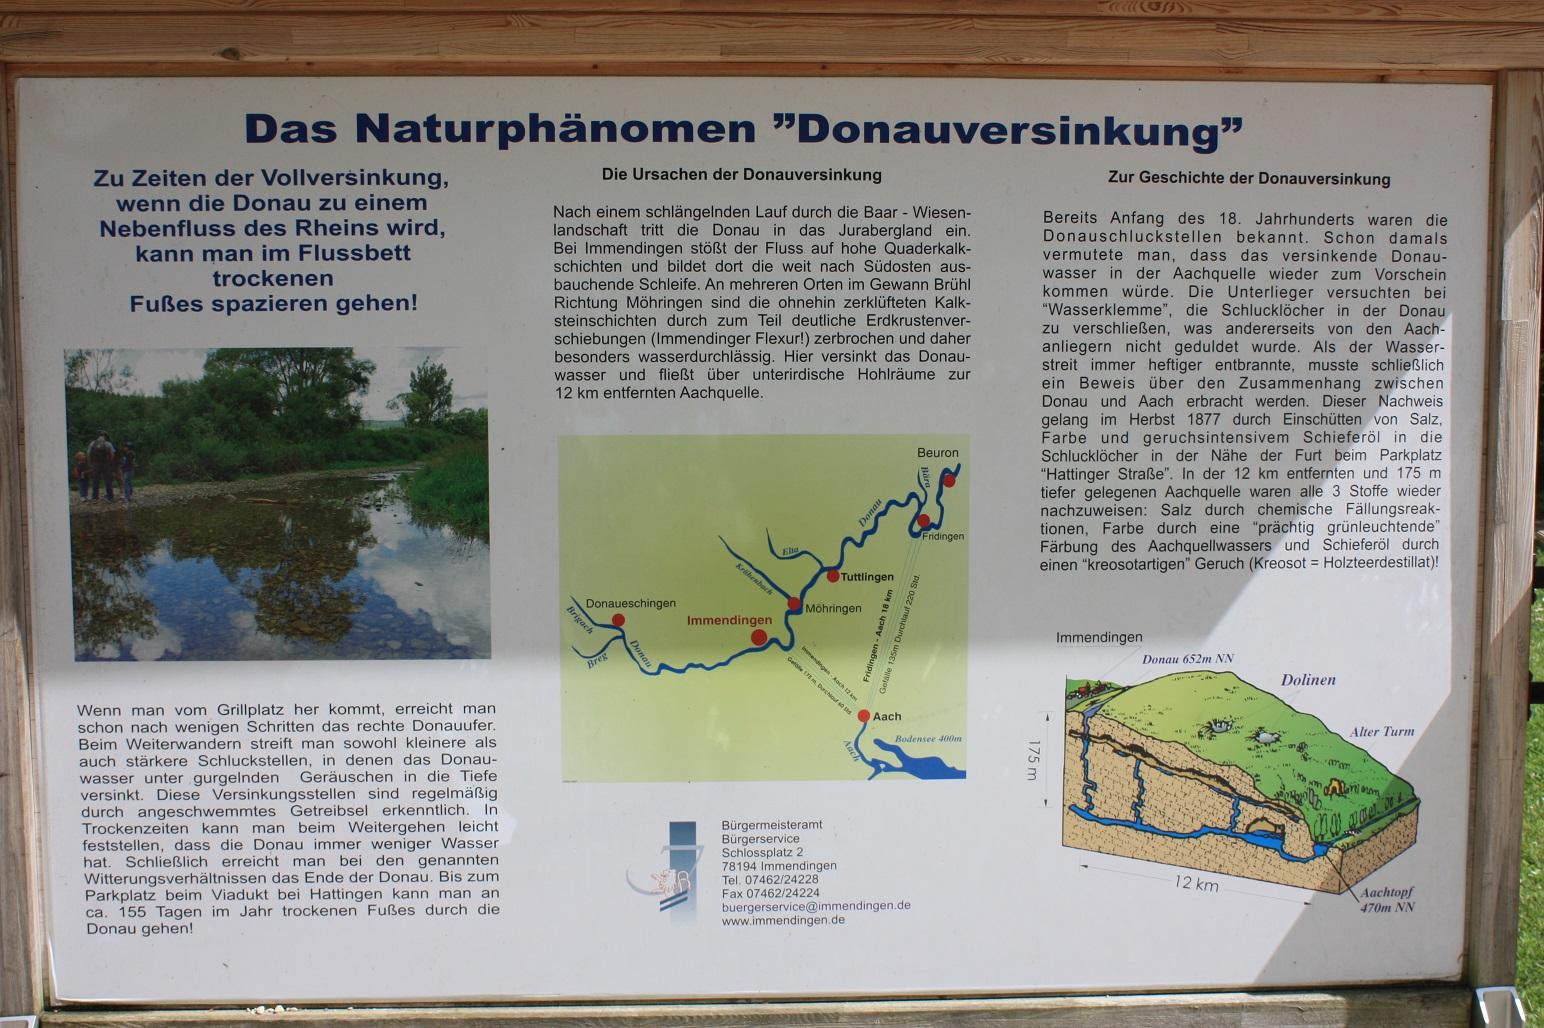 Phänomen Donauversinkung